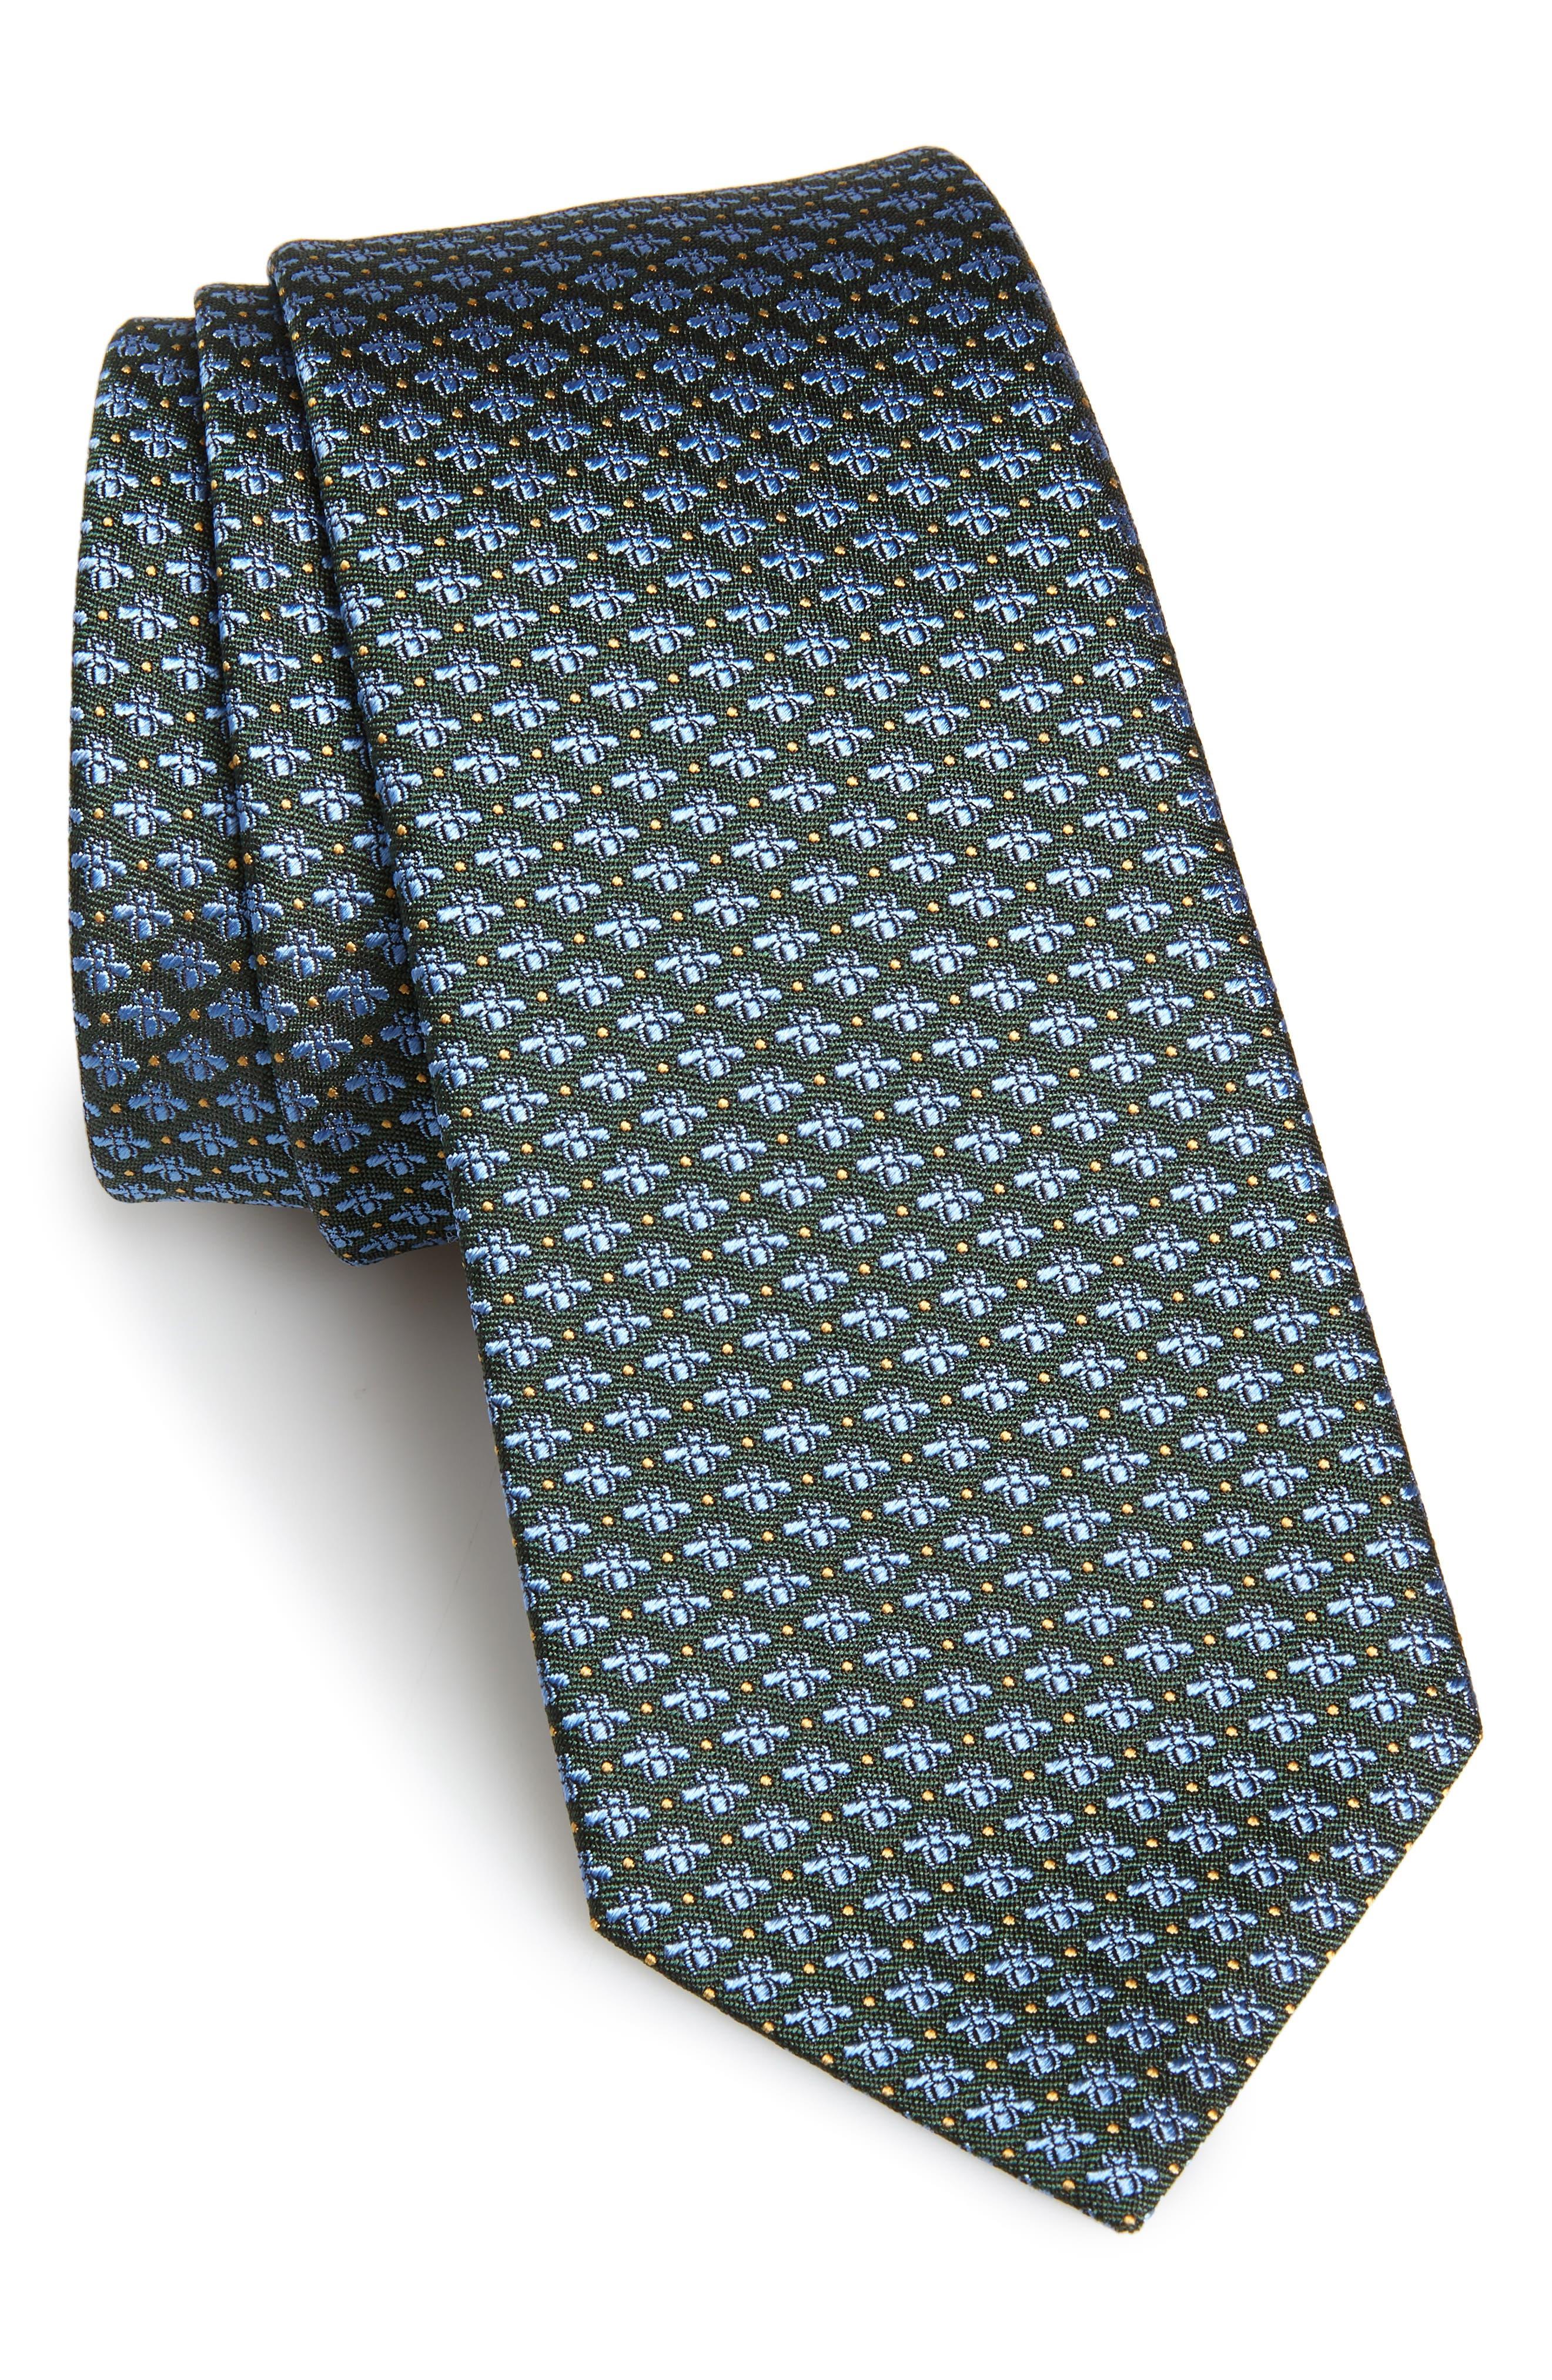 GUCCI, 7.0 Woven Silk Tie, Main thumbnail 1, color, SAGE